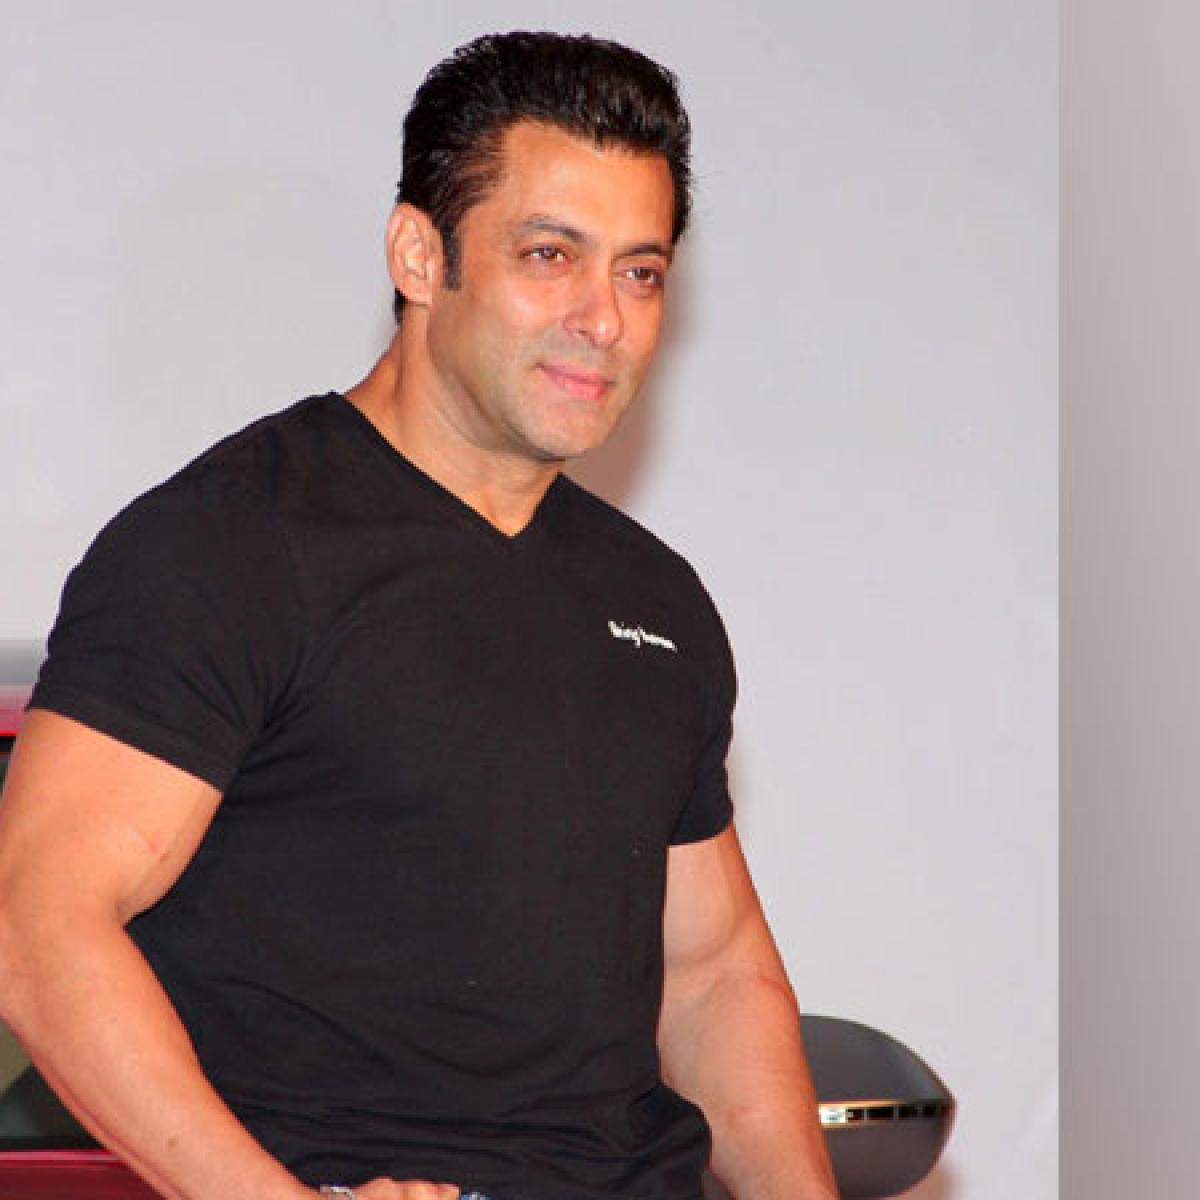 Blackbuck poaching case: Court acquits Salman Khan for submitting fake affidavit